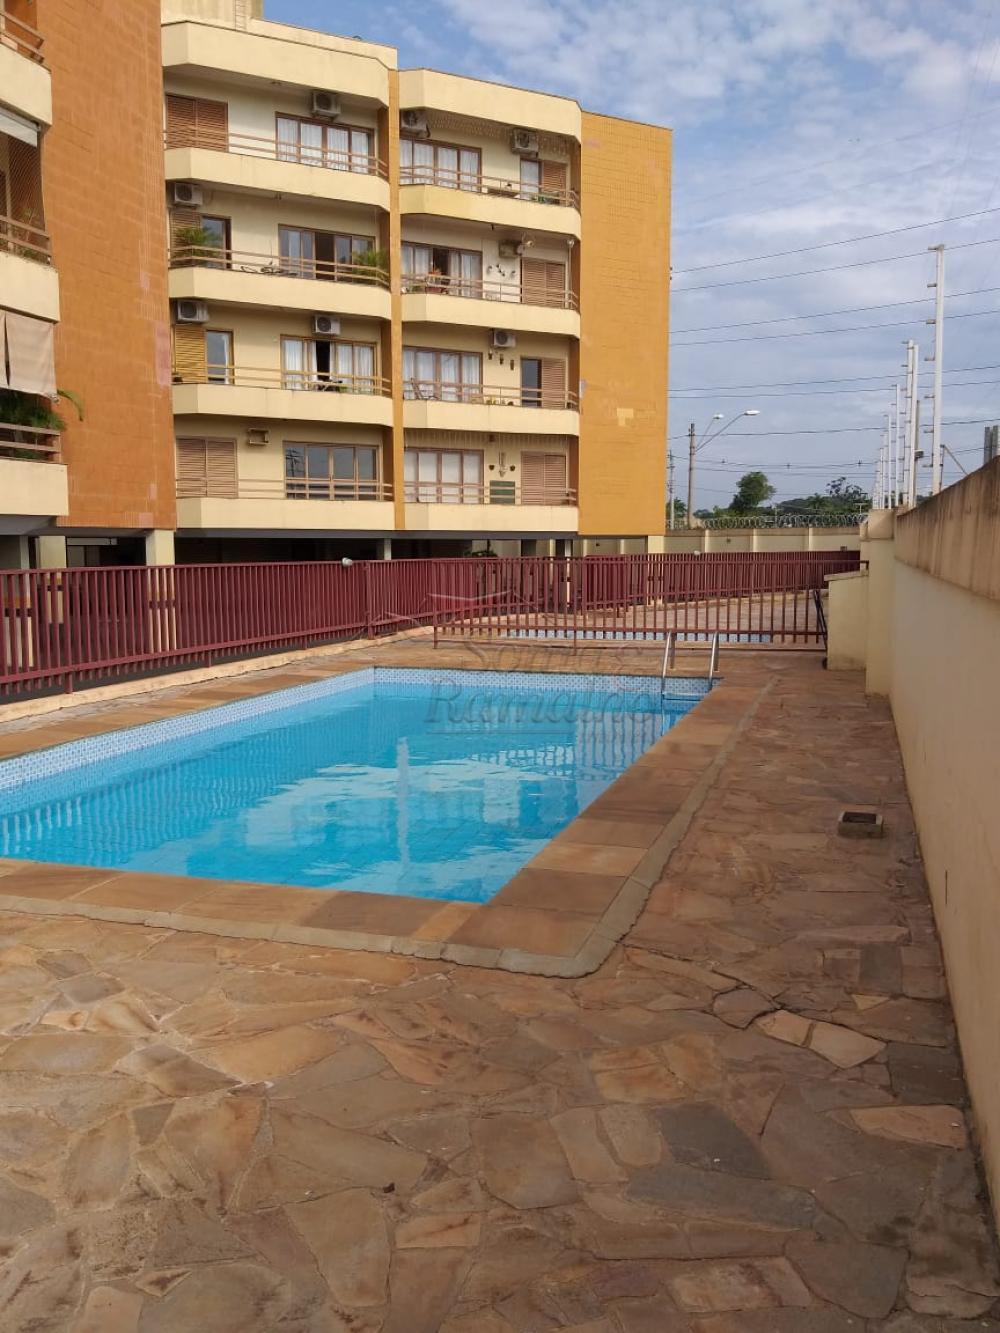 Ribeirao Preto Apartamento Venda R$196.000,00 2 Dormitorios 1 Suite Area do terreno 87.00m2 Area construida 87.00m2